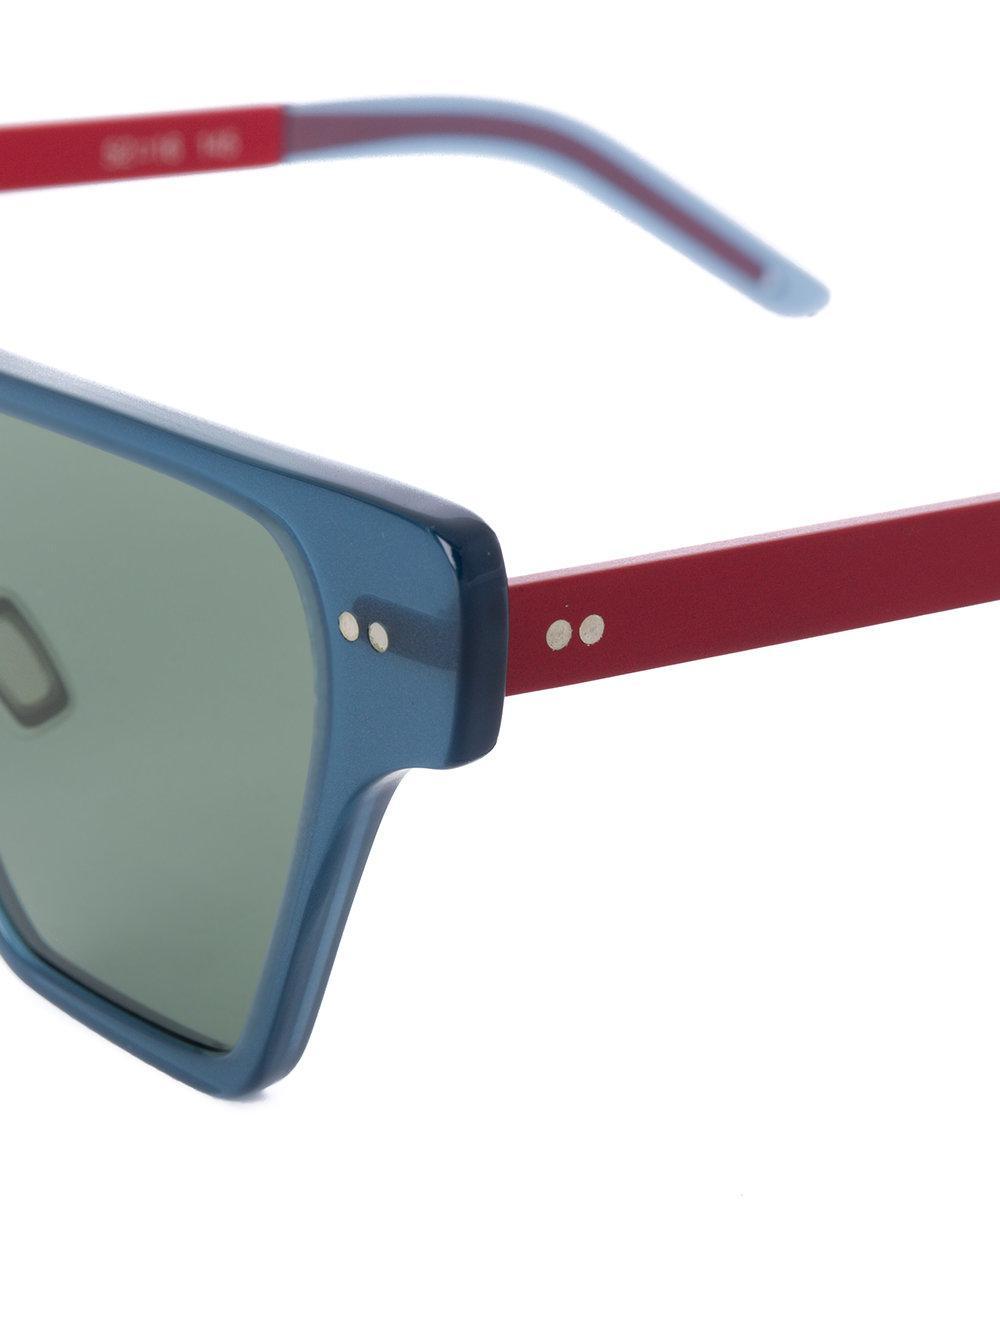 31dcf5fee3 Lyst - Delirious Eyewear Cheetah Sunglasses in Blue